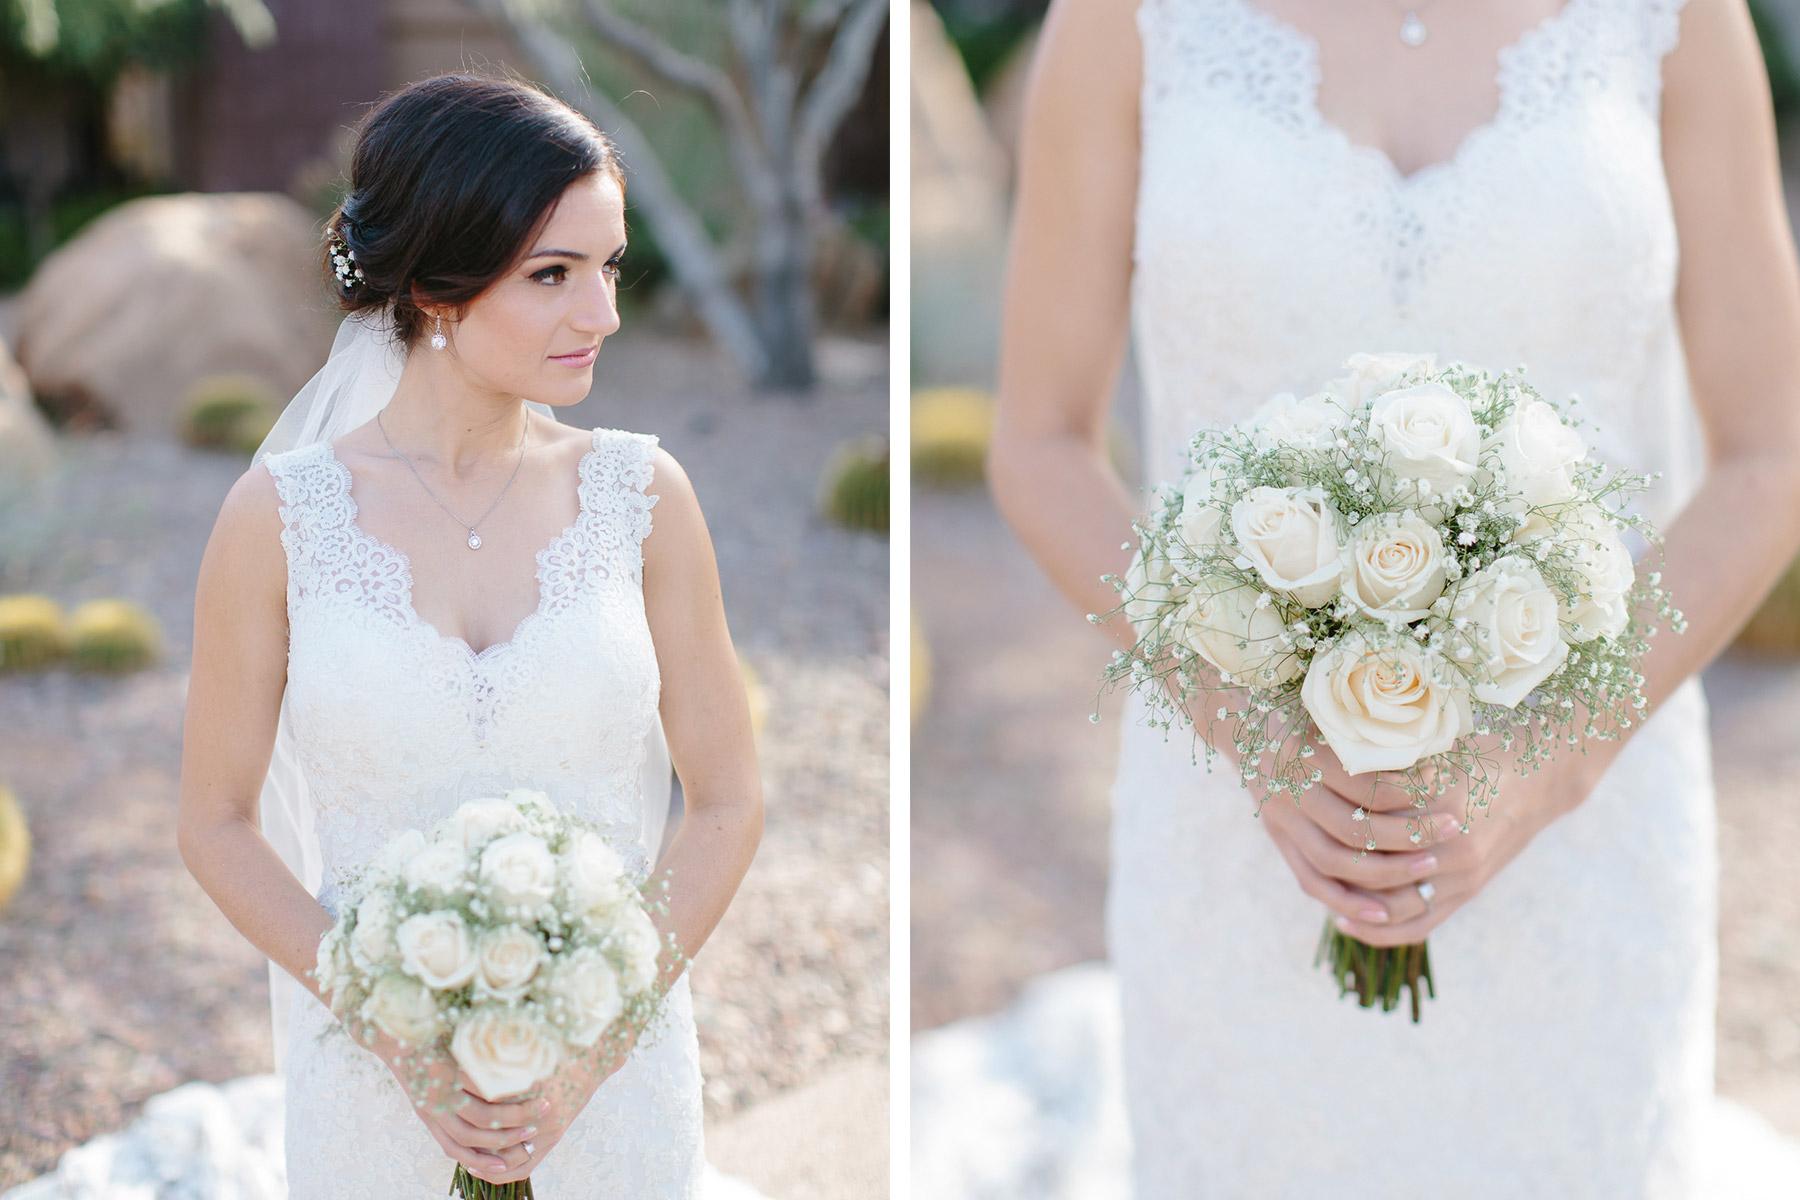 161210-Luxium-Weddings-Arizona-Matt-Jenny-Anthem-Golf-Country-Club-1006a.jpg